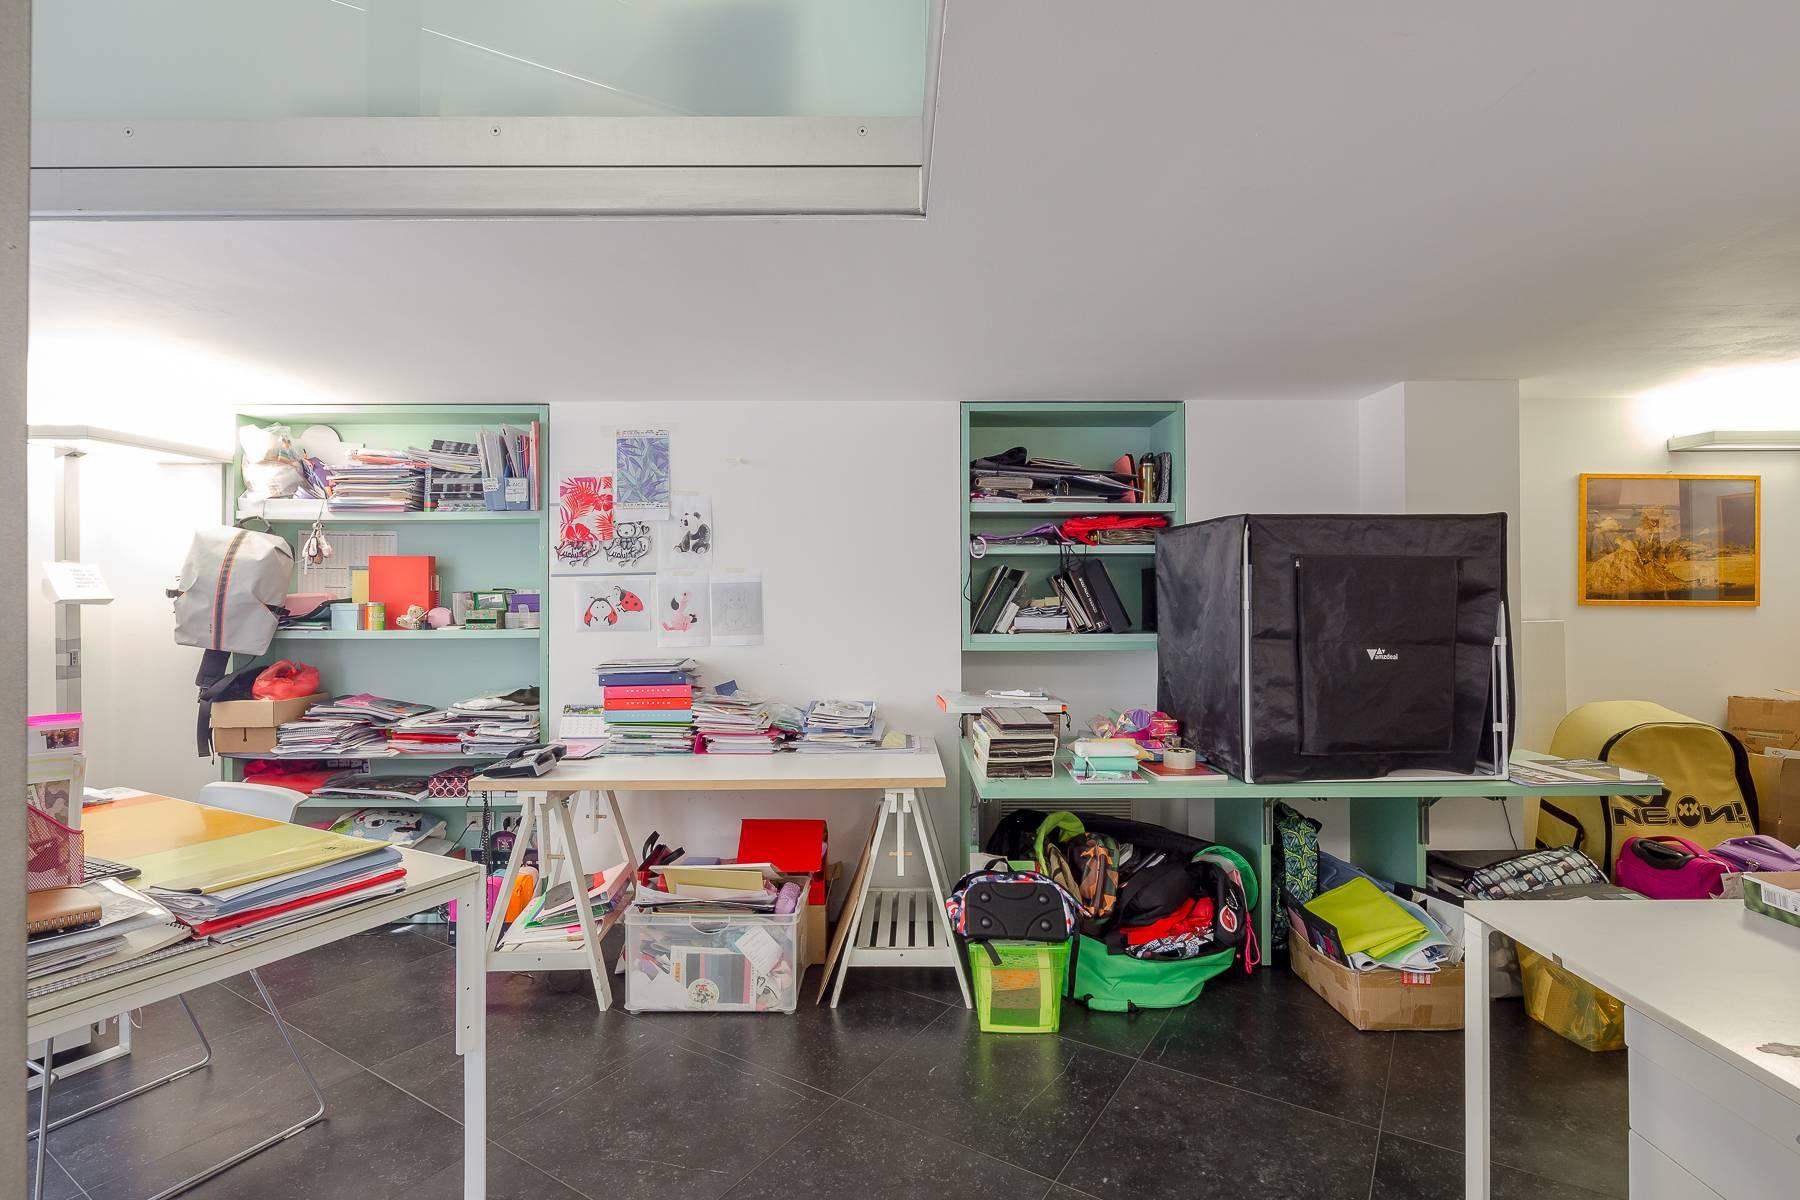 Open space office/residential property in Piazza Giovine Italia/Via Aurelio Saffi - 6